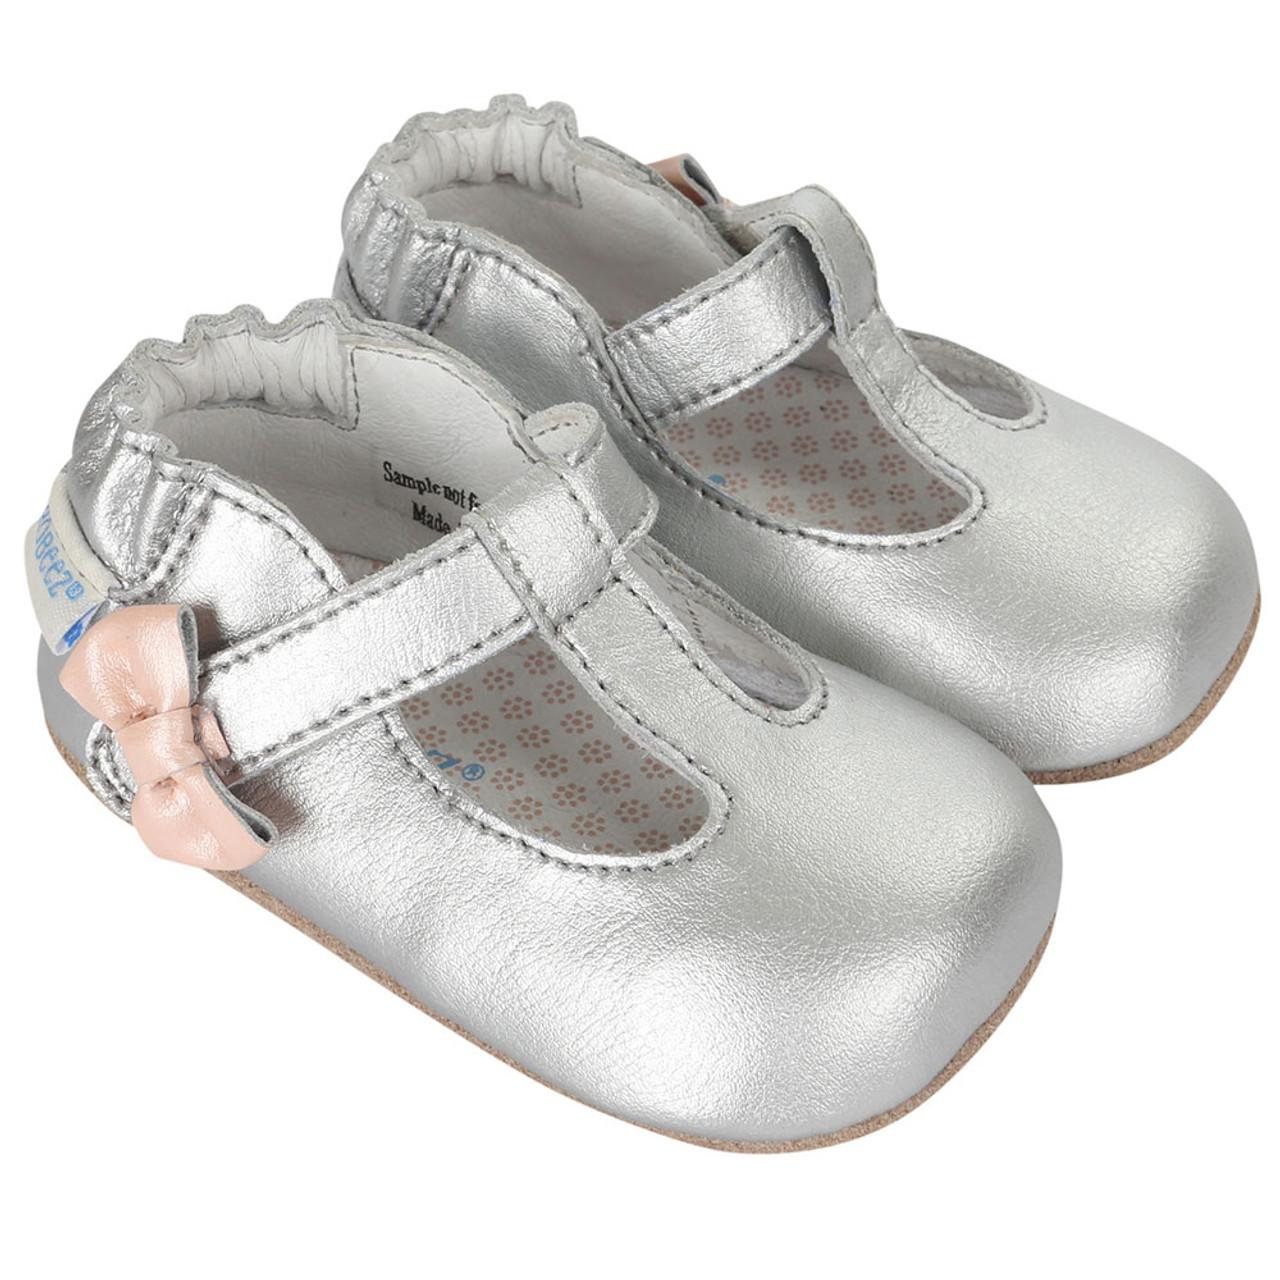 117c3a0f0af Robeez Teagan s Tee Strap Mini Shoez - Angle